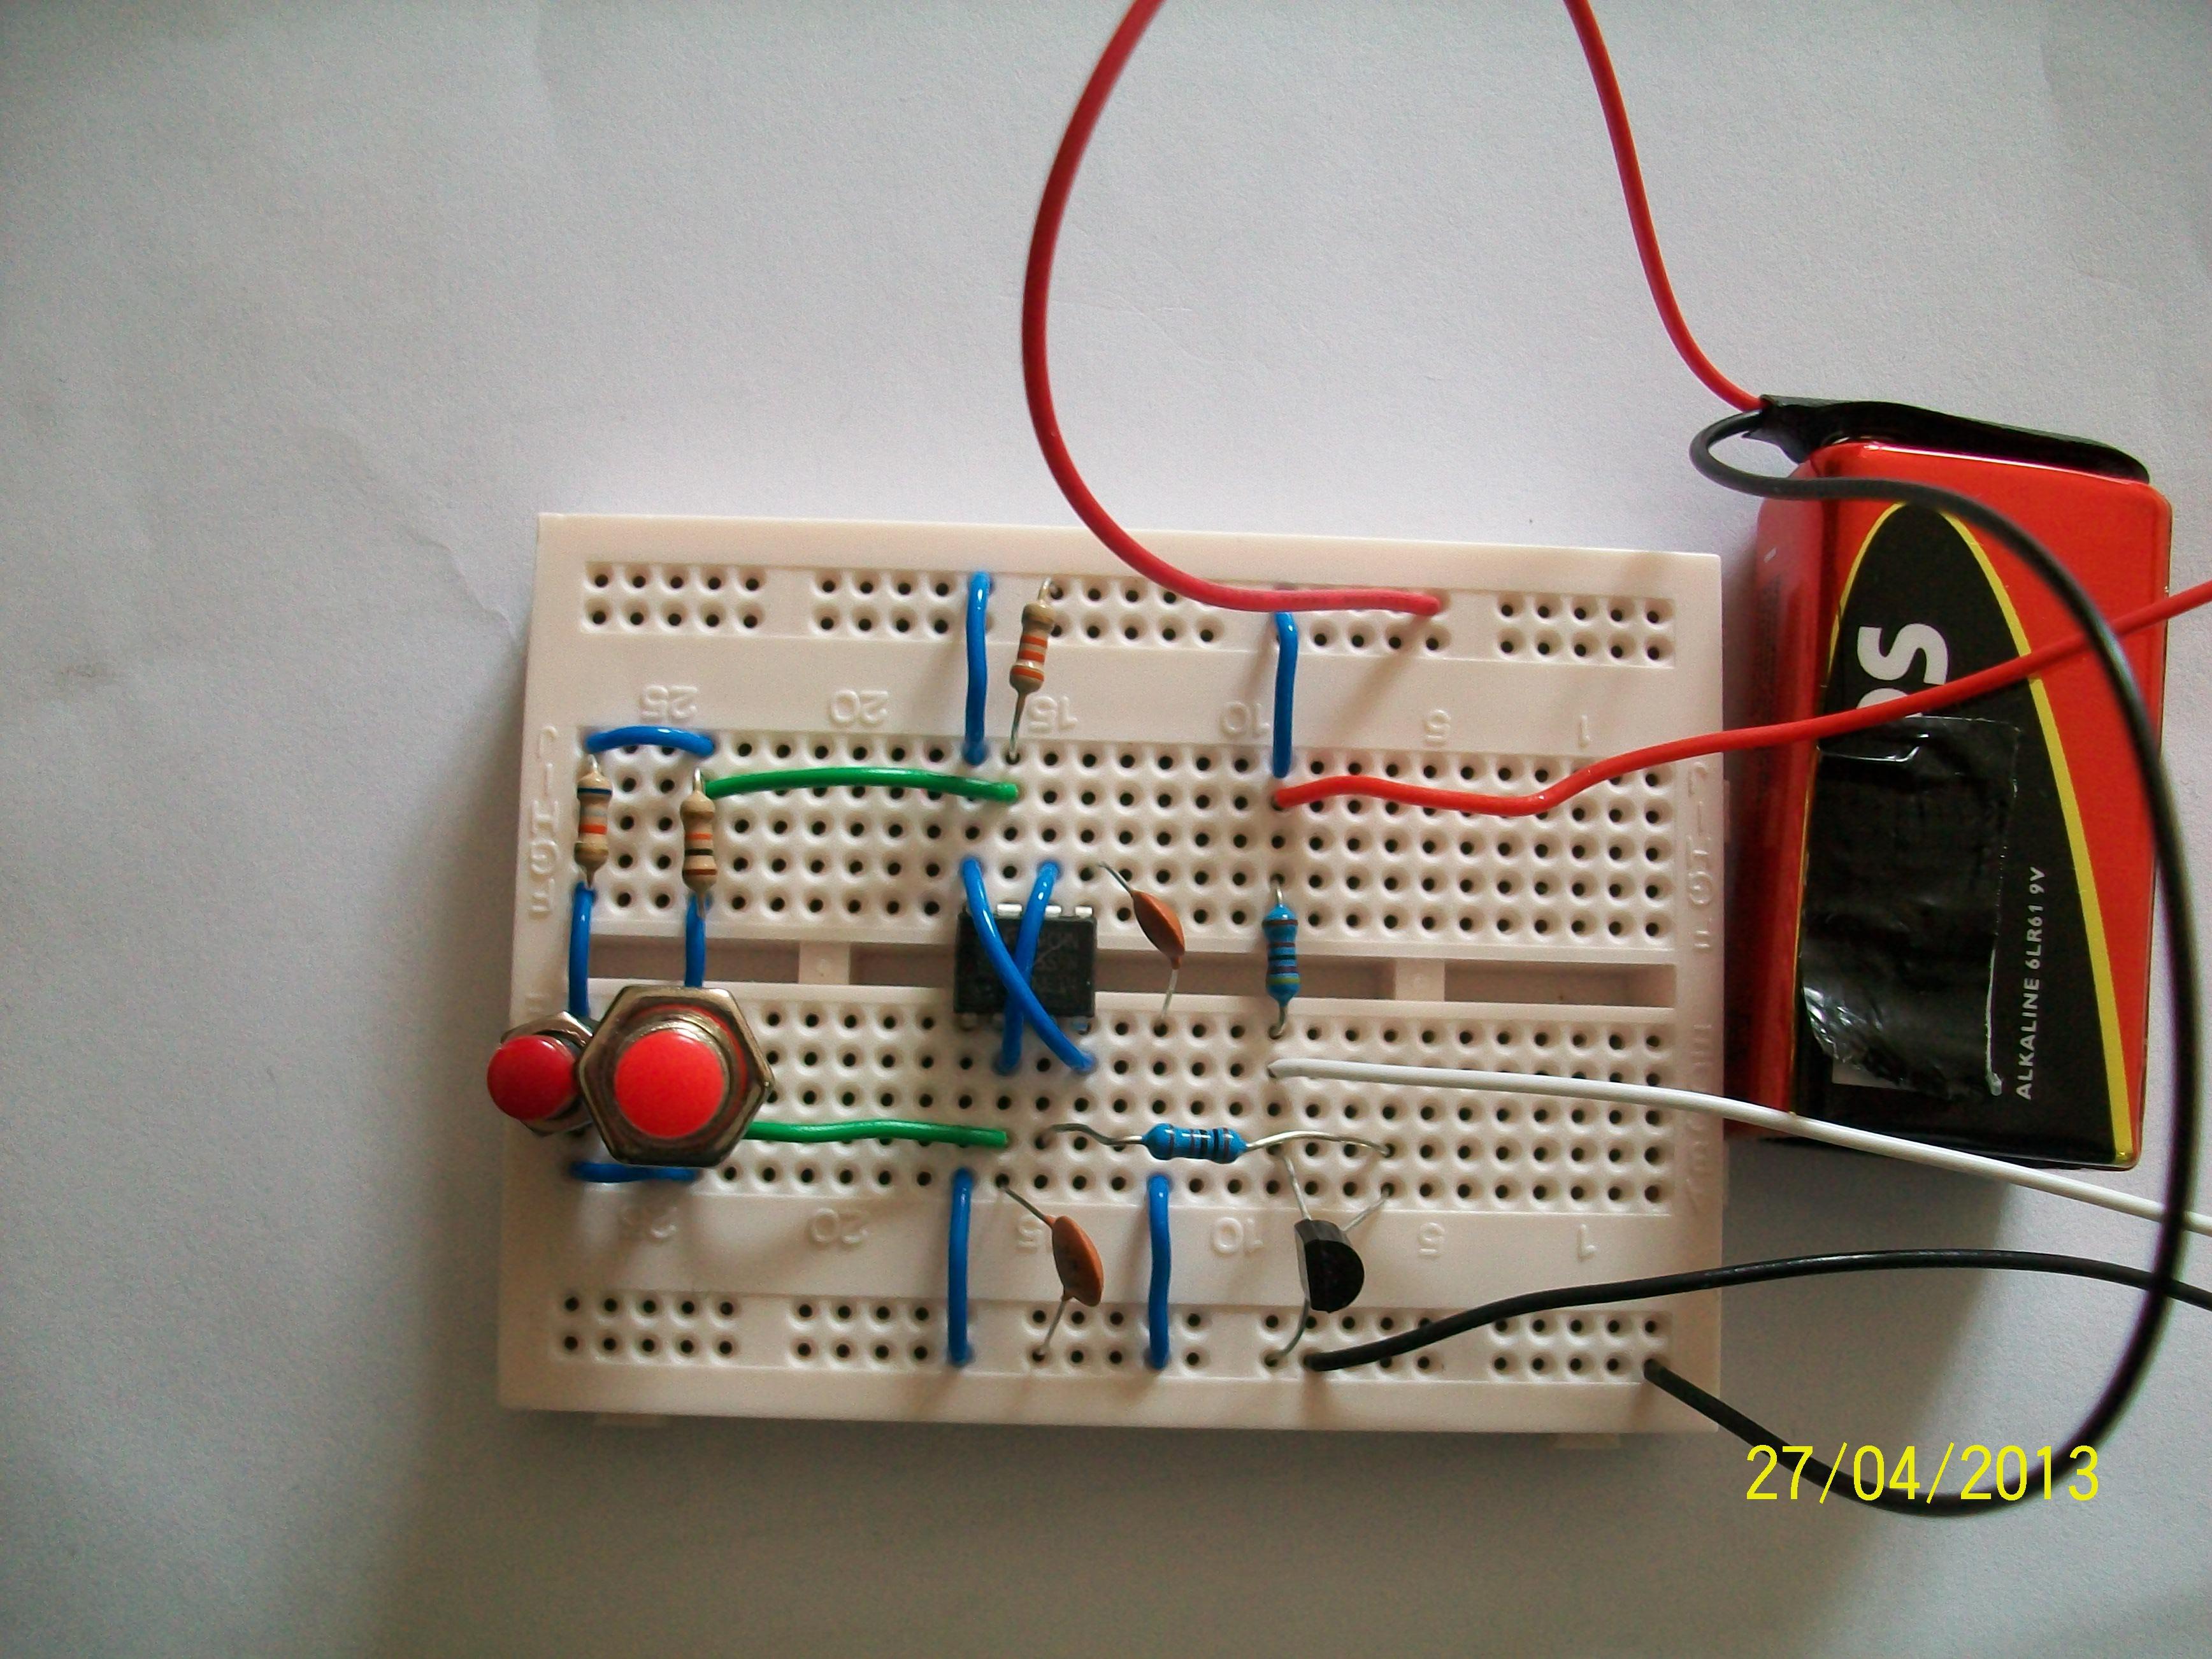 Servo Motor Tester Circuit Diagram Using Ic 555